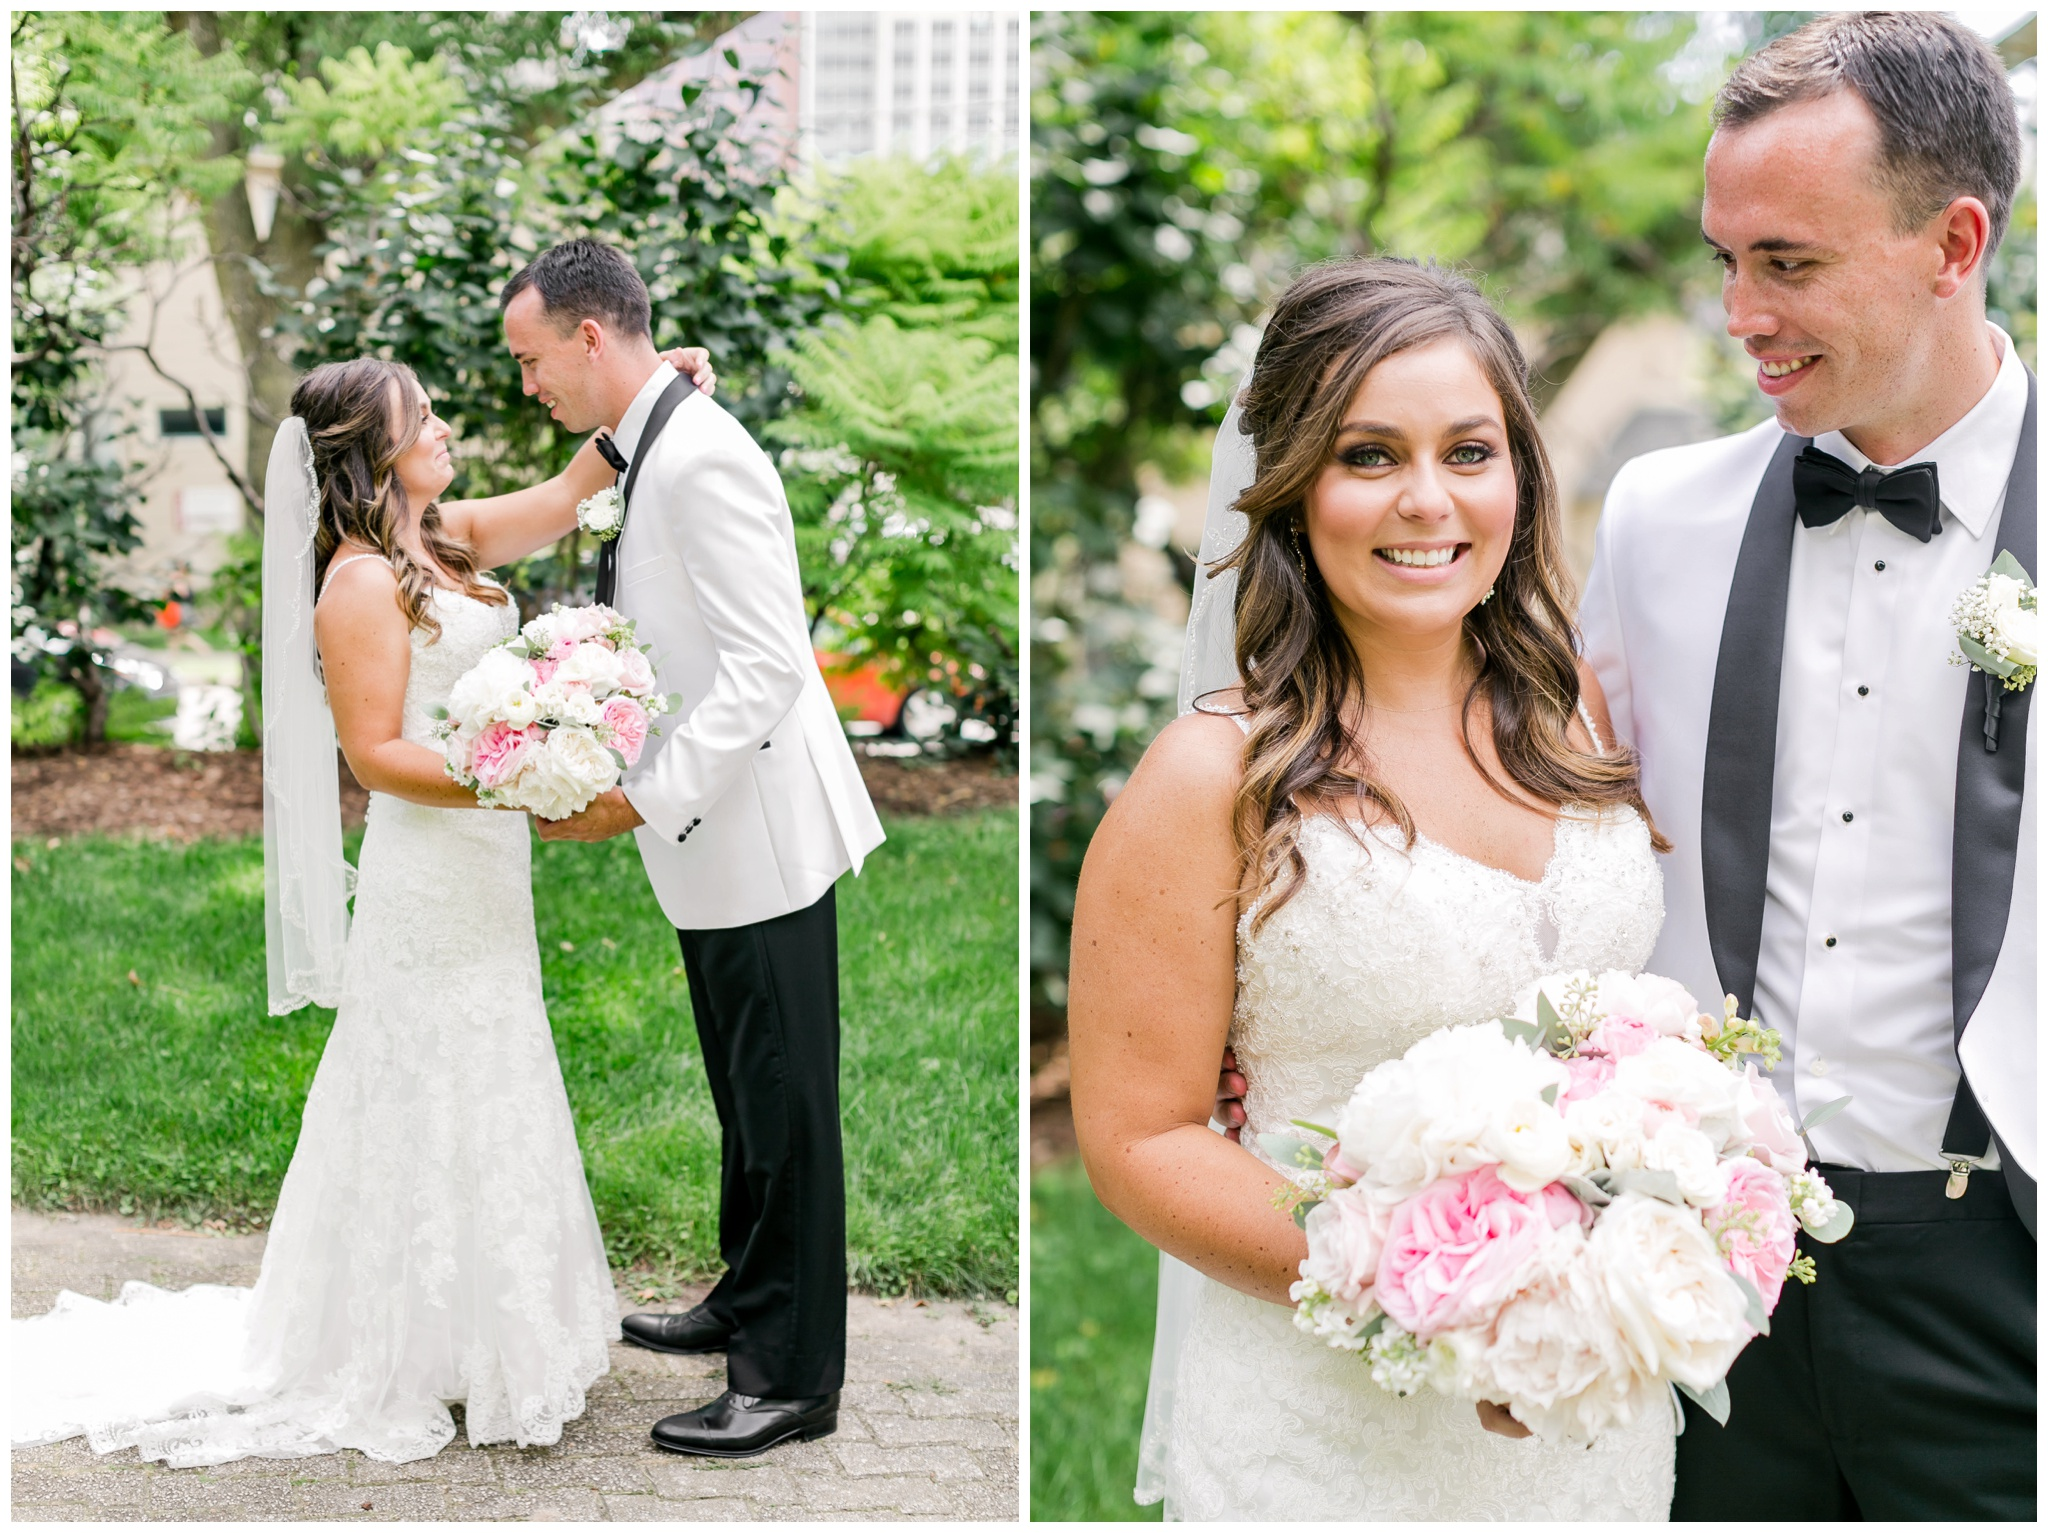 UW_Memorial_Union_wedding_madison_wisconsin_wedding_photographers_4590.jpg